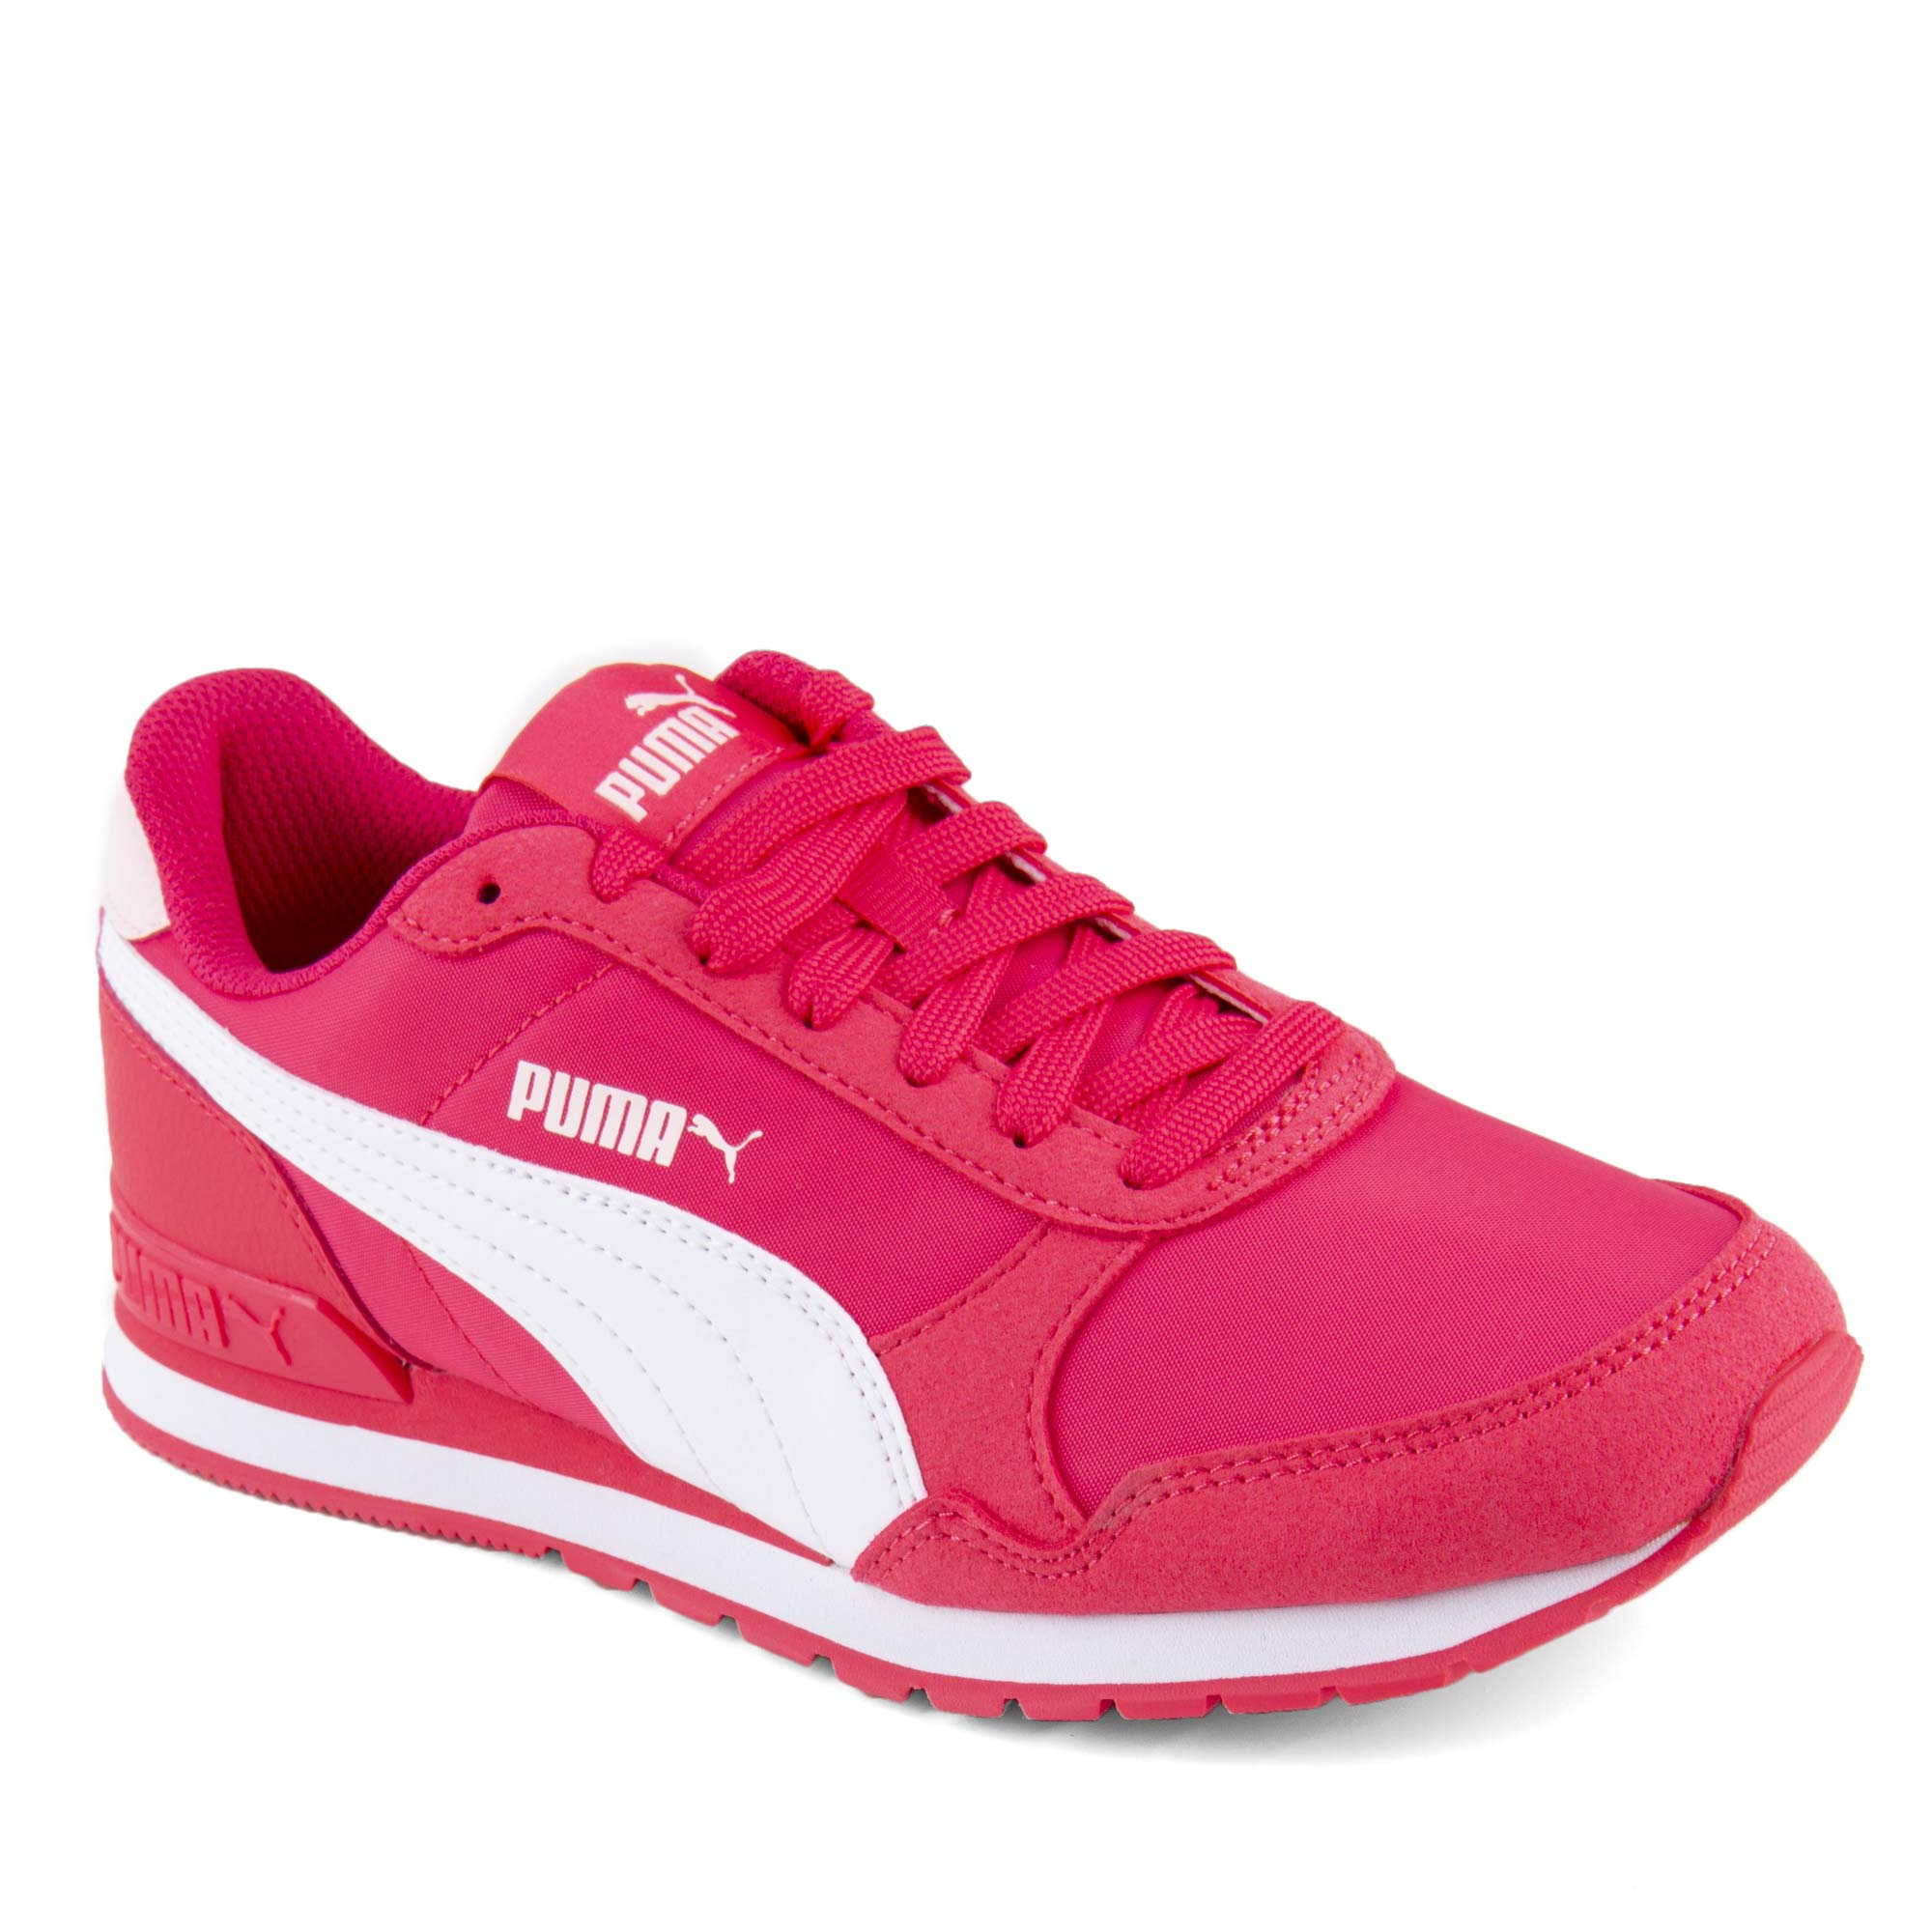 chaussures baskets femme puma